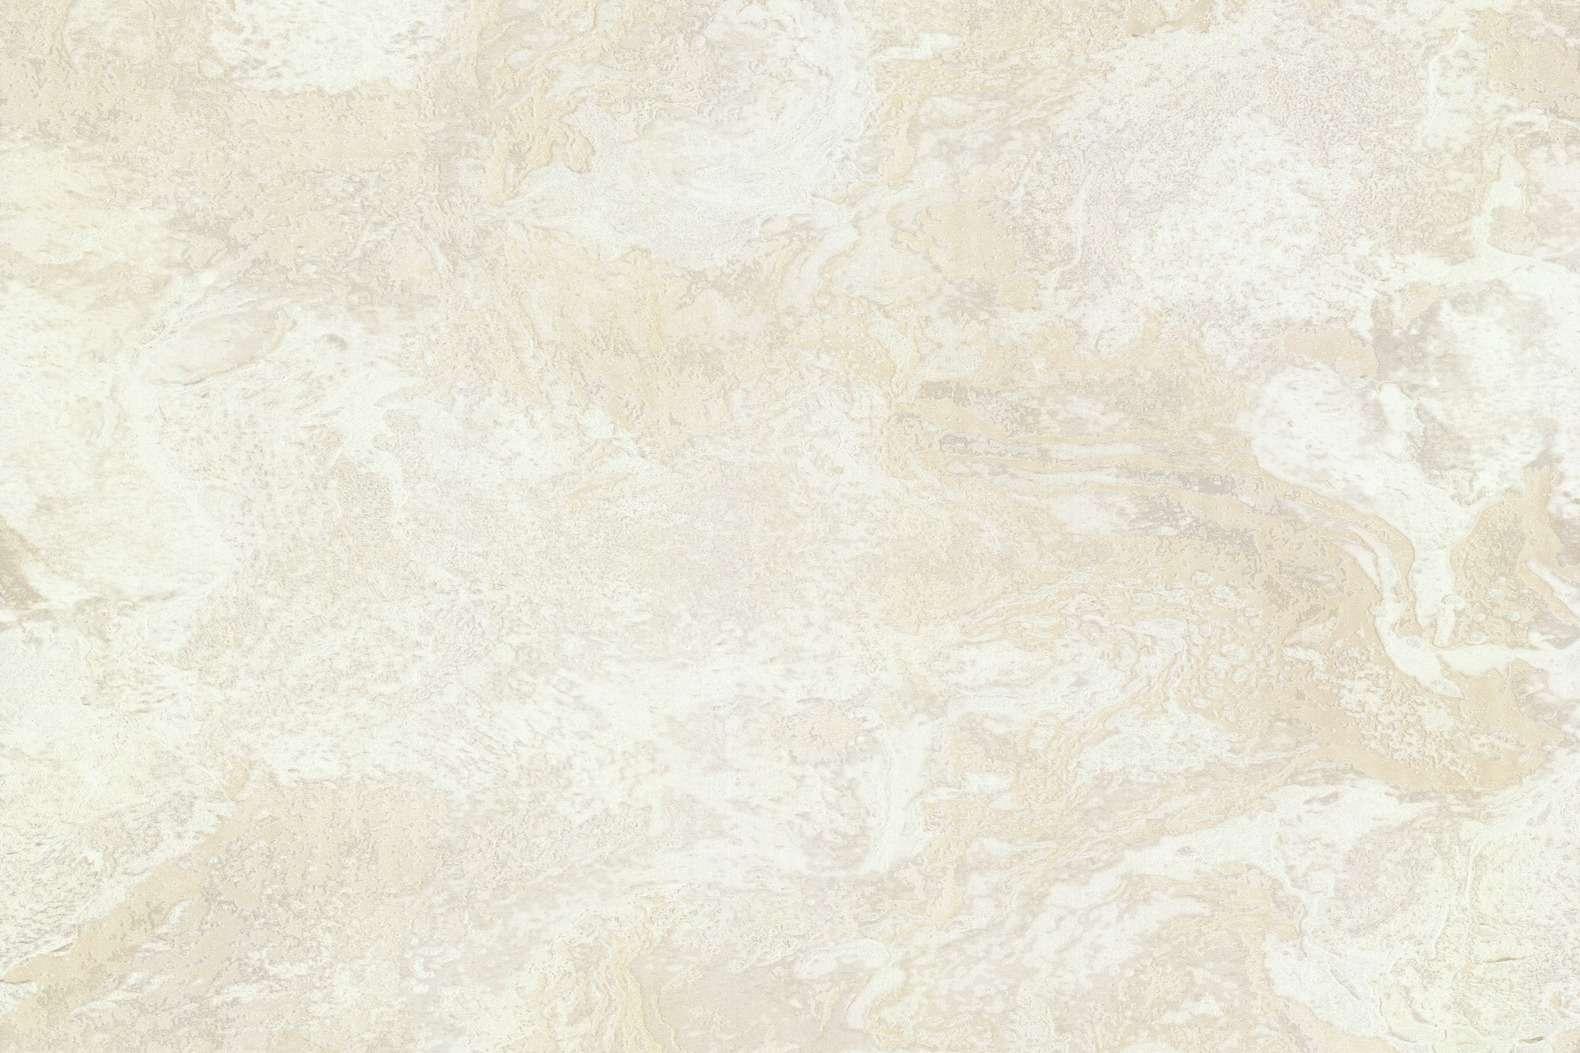 Обои Decori & Decori Carrara 2 — Декори Каррара 2 83671